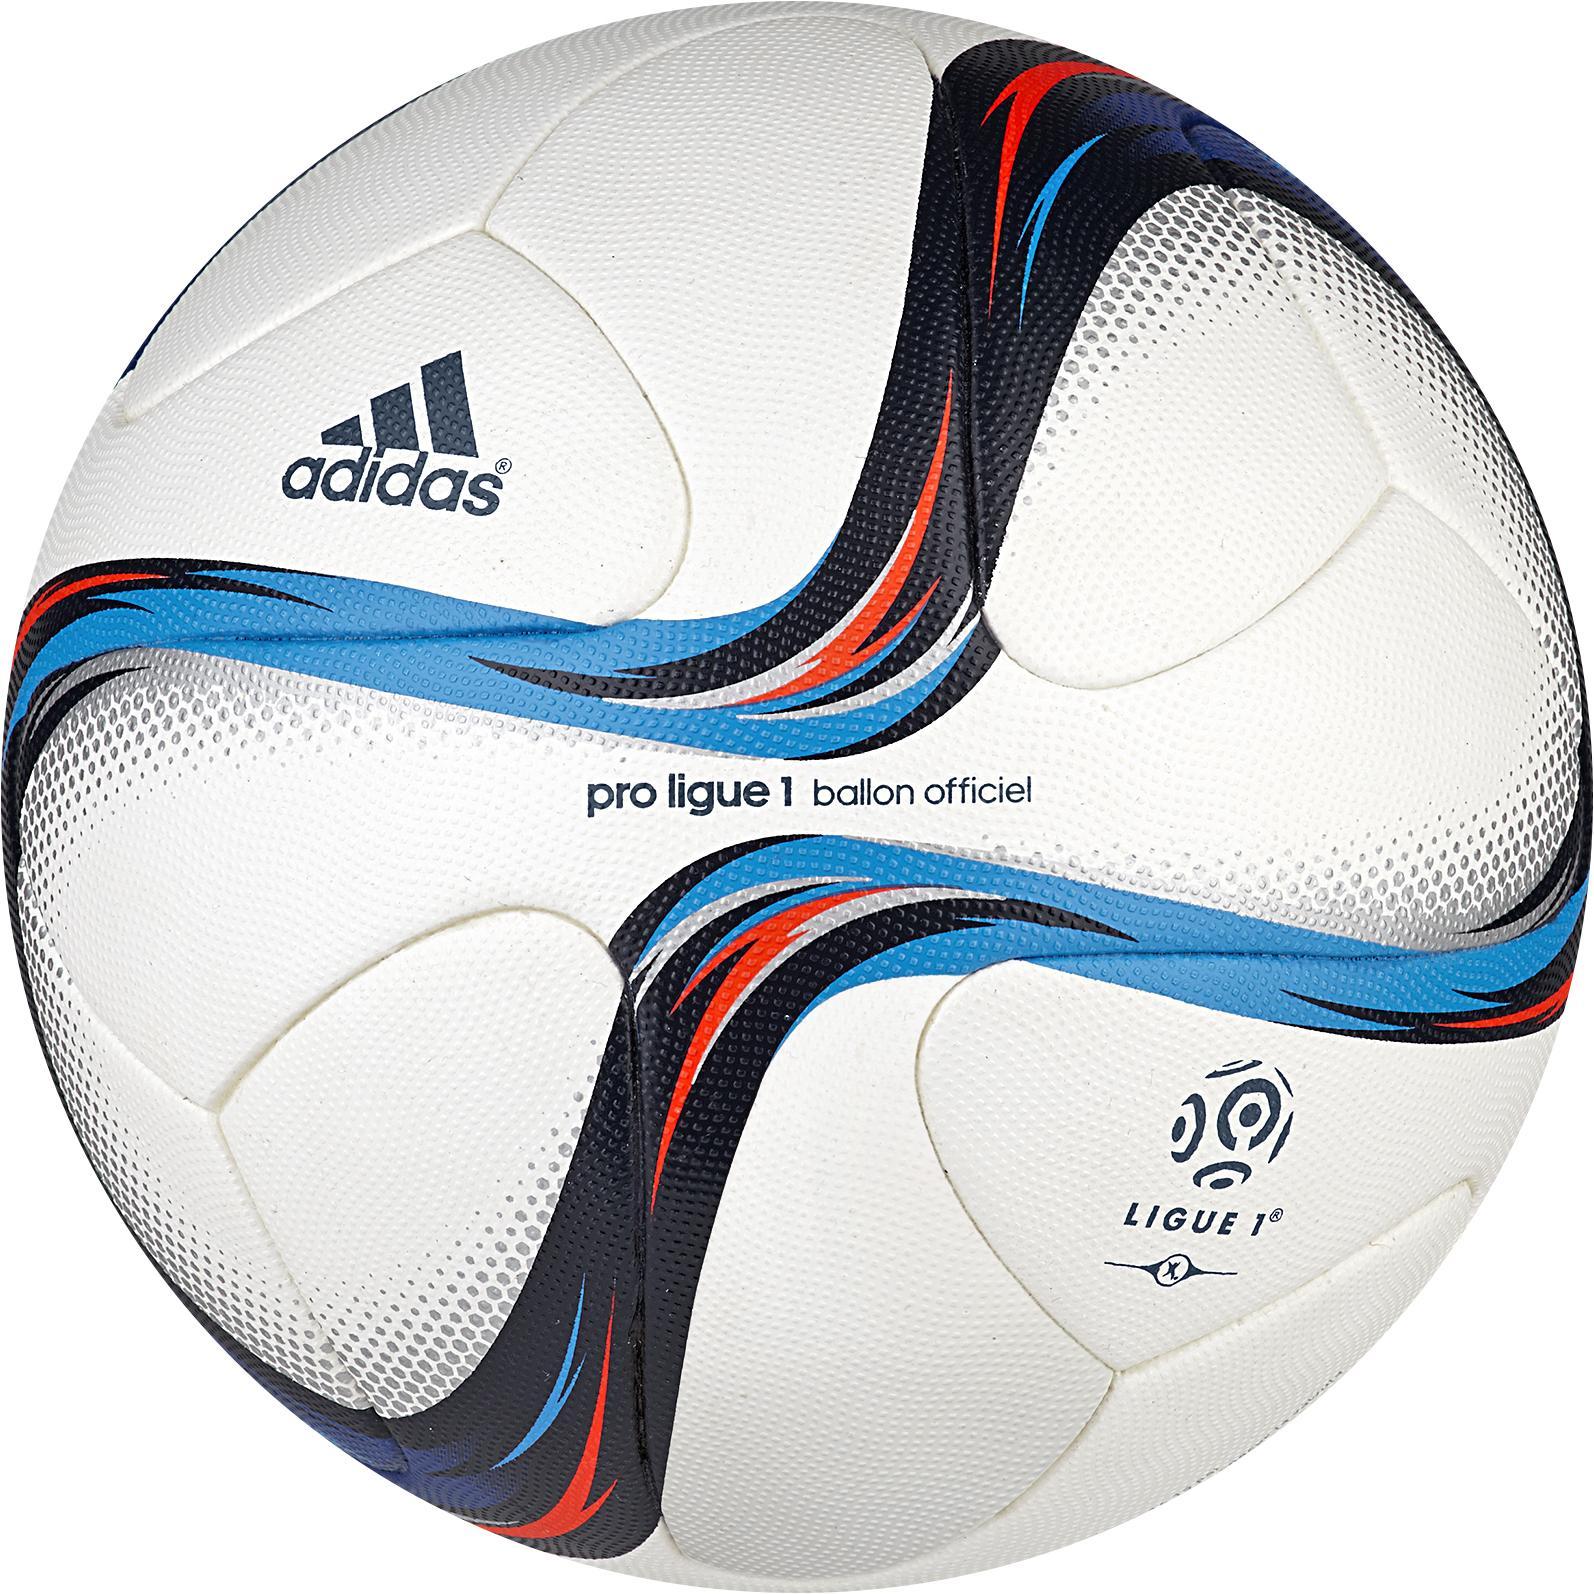 adidas Fotboll Pro Ligue 1 2015/16 Matchboll